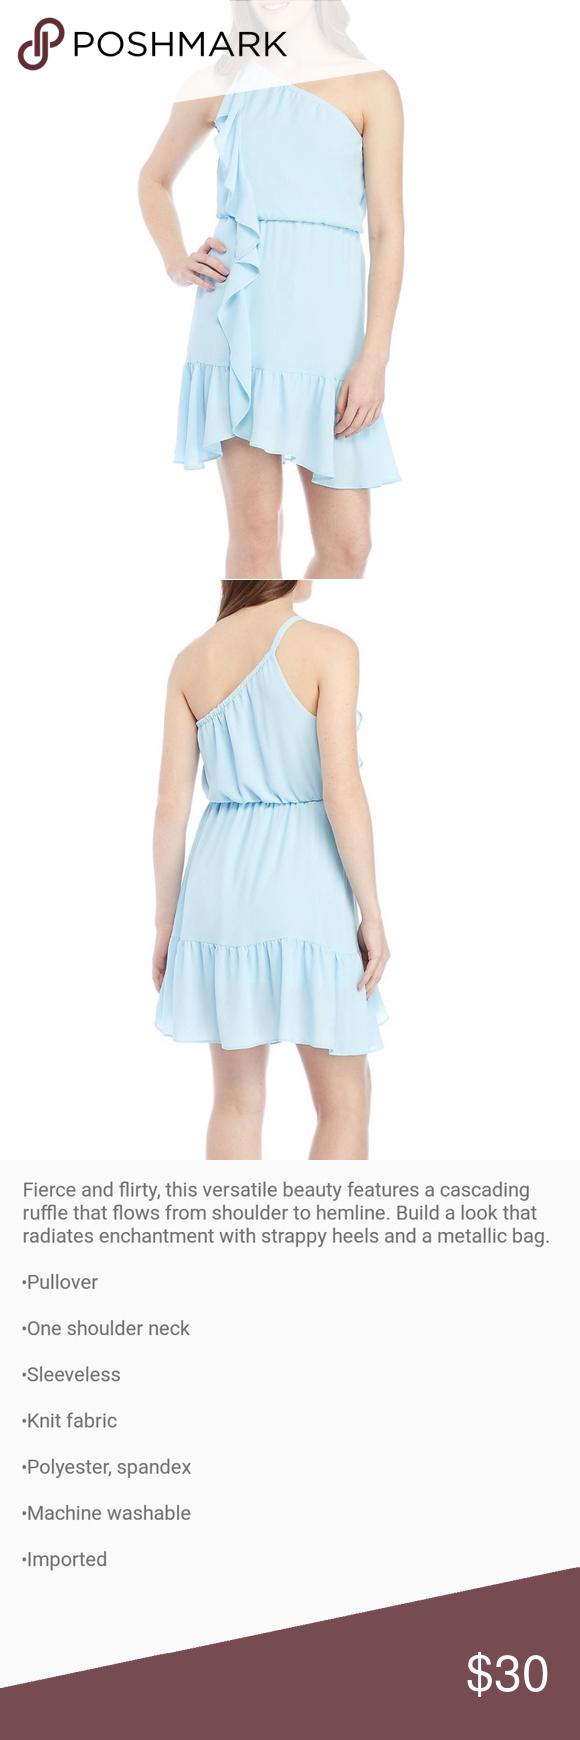 23 Kaari Blue Petite One Shoulder Dress Baby Blue Kaari Blue Petite One Shoulder Dress In Baby Blue Kaari Blue Dresses O Clothes Design Fashion Fashion Design [ 1740 x 580 Pixel ]